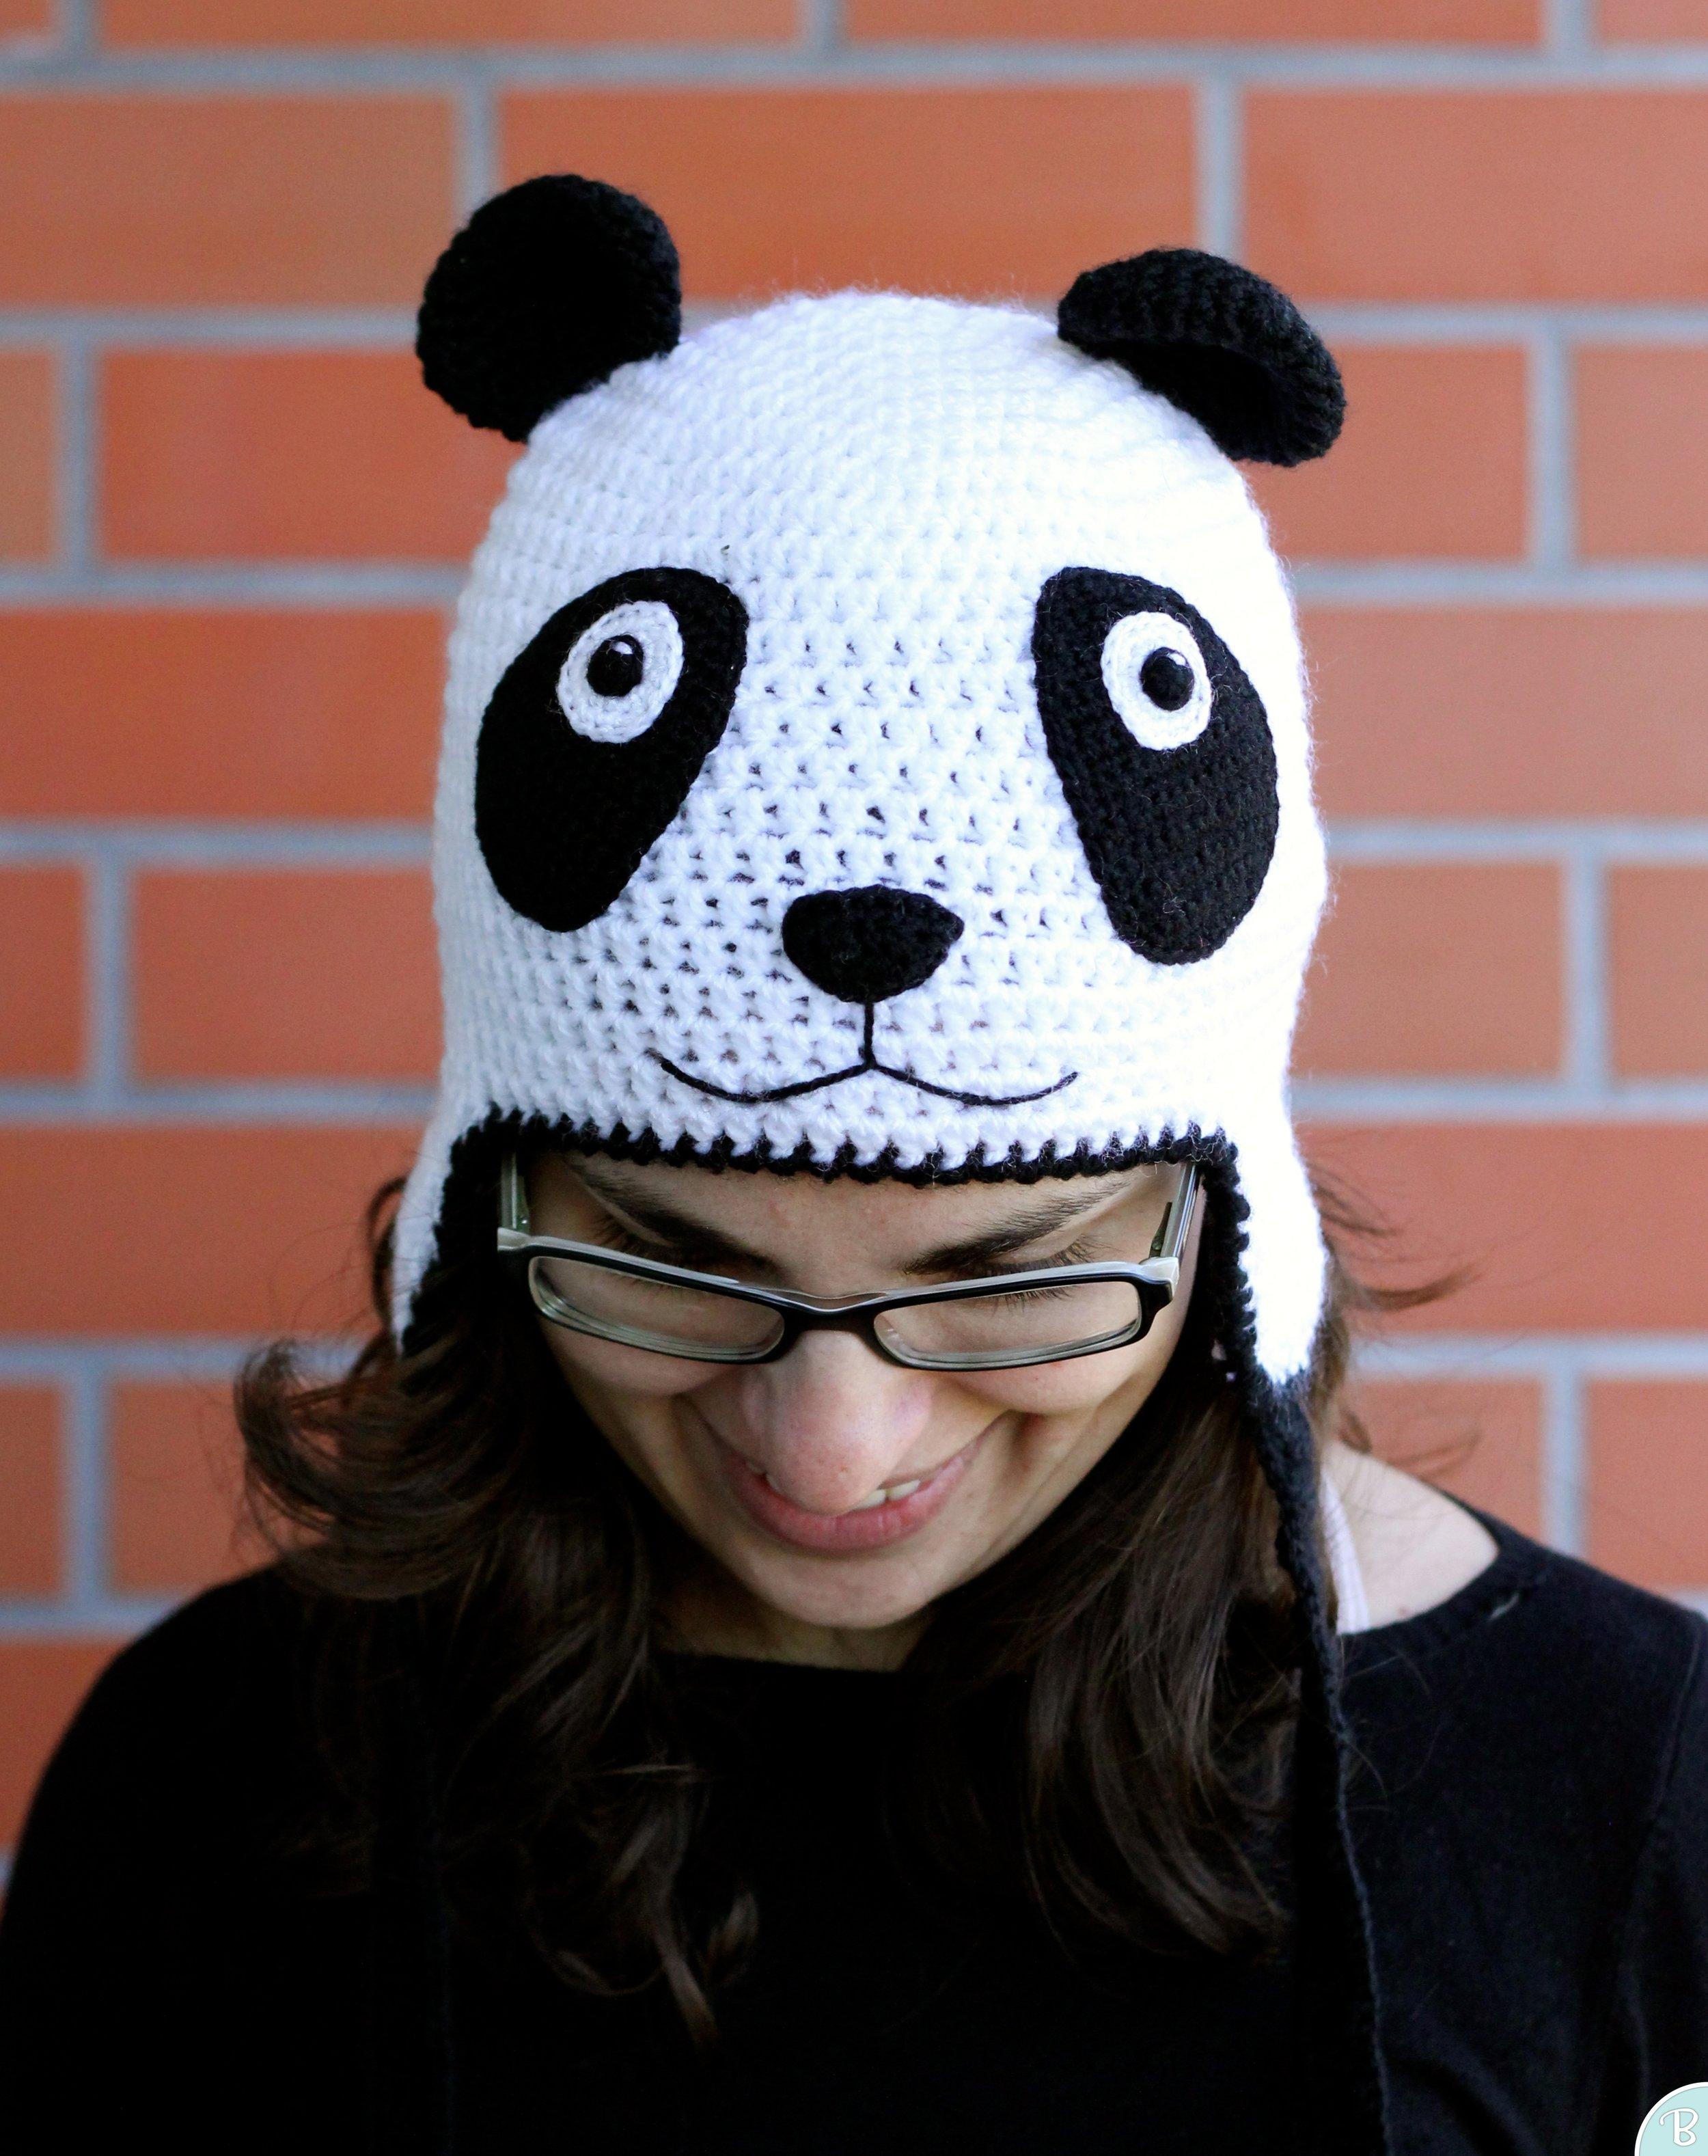 Panda crochet hat